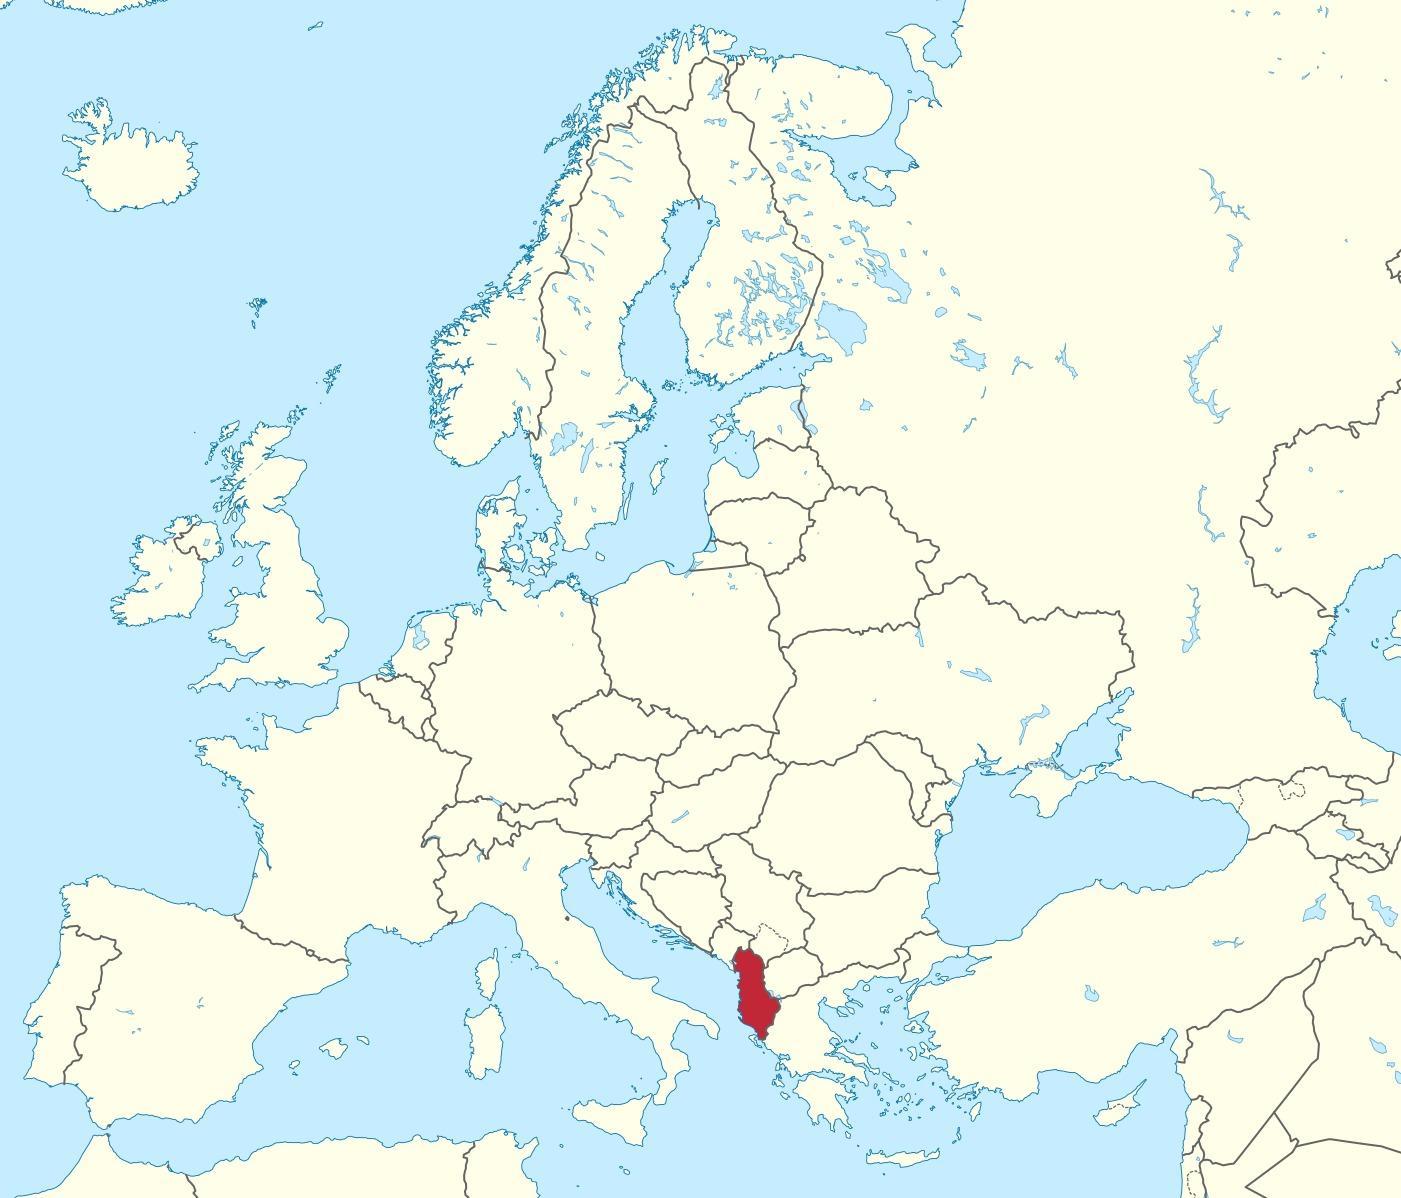 Albanien Pa Europas Karta Karta Over Albanien Pa Europeisk